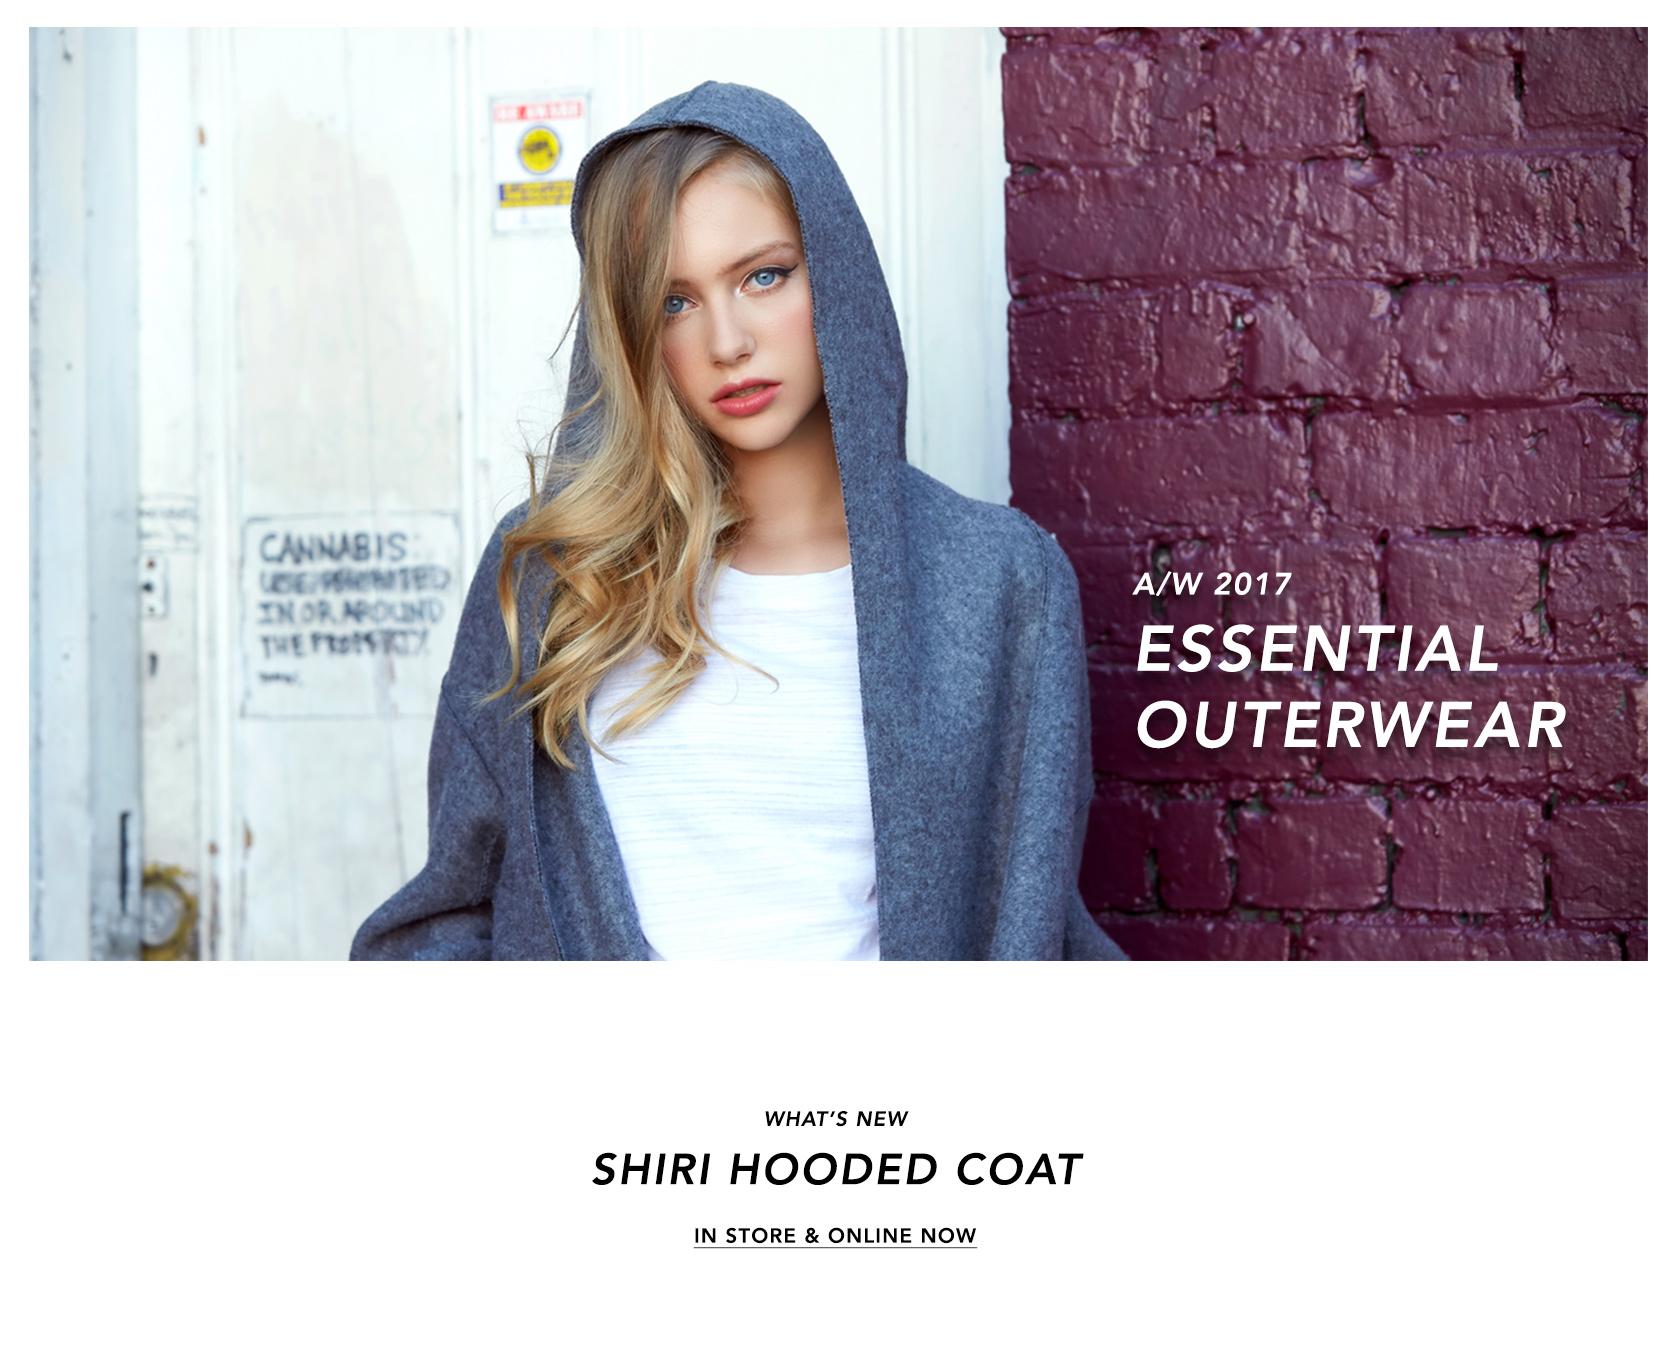 Essential outerwear